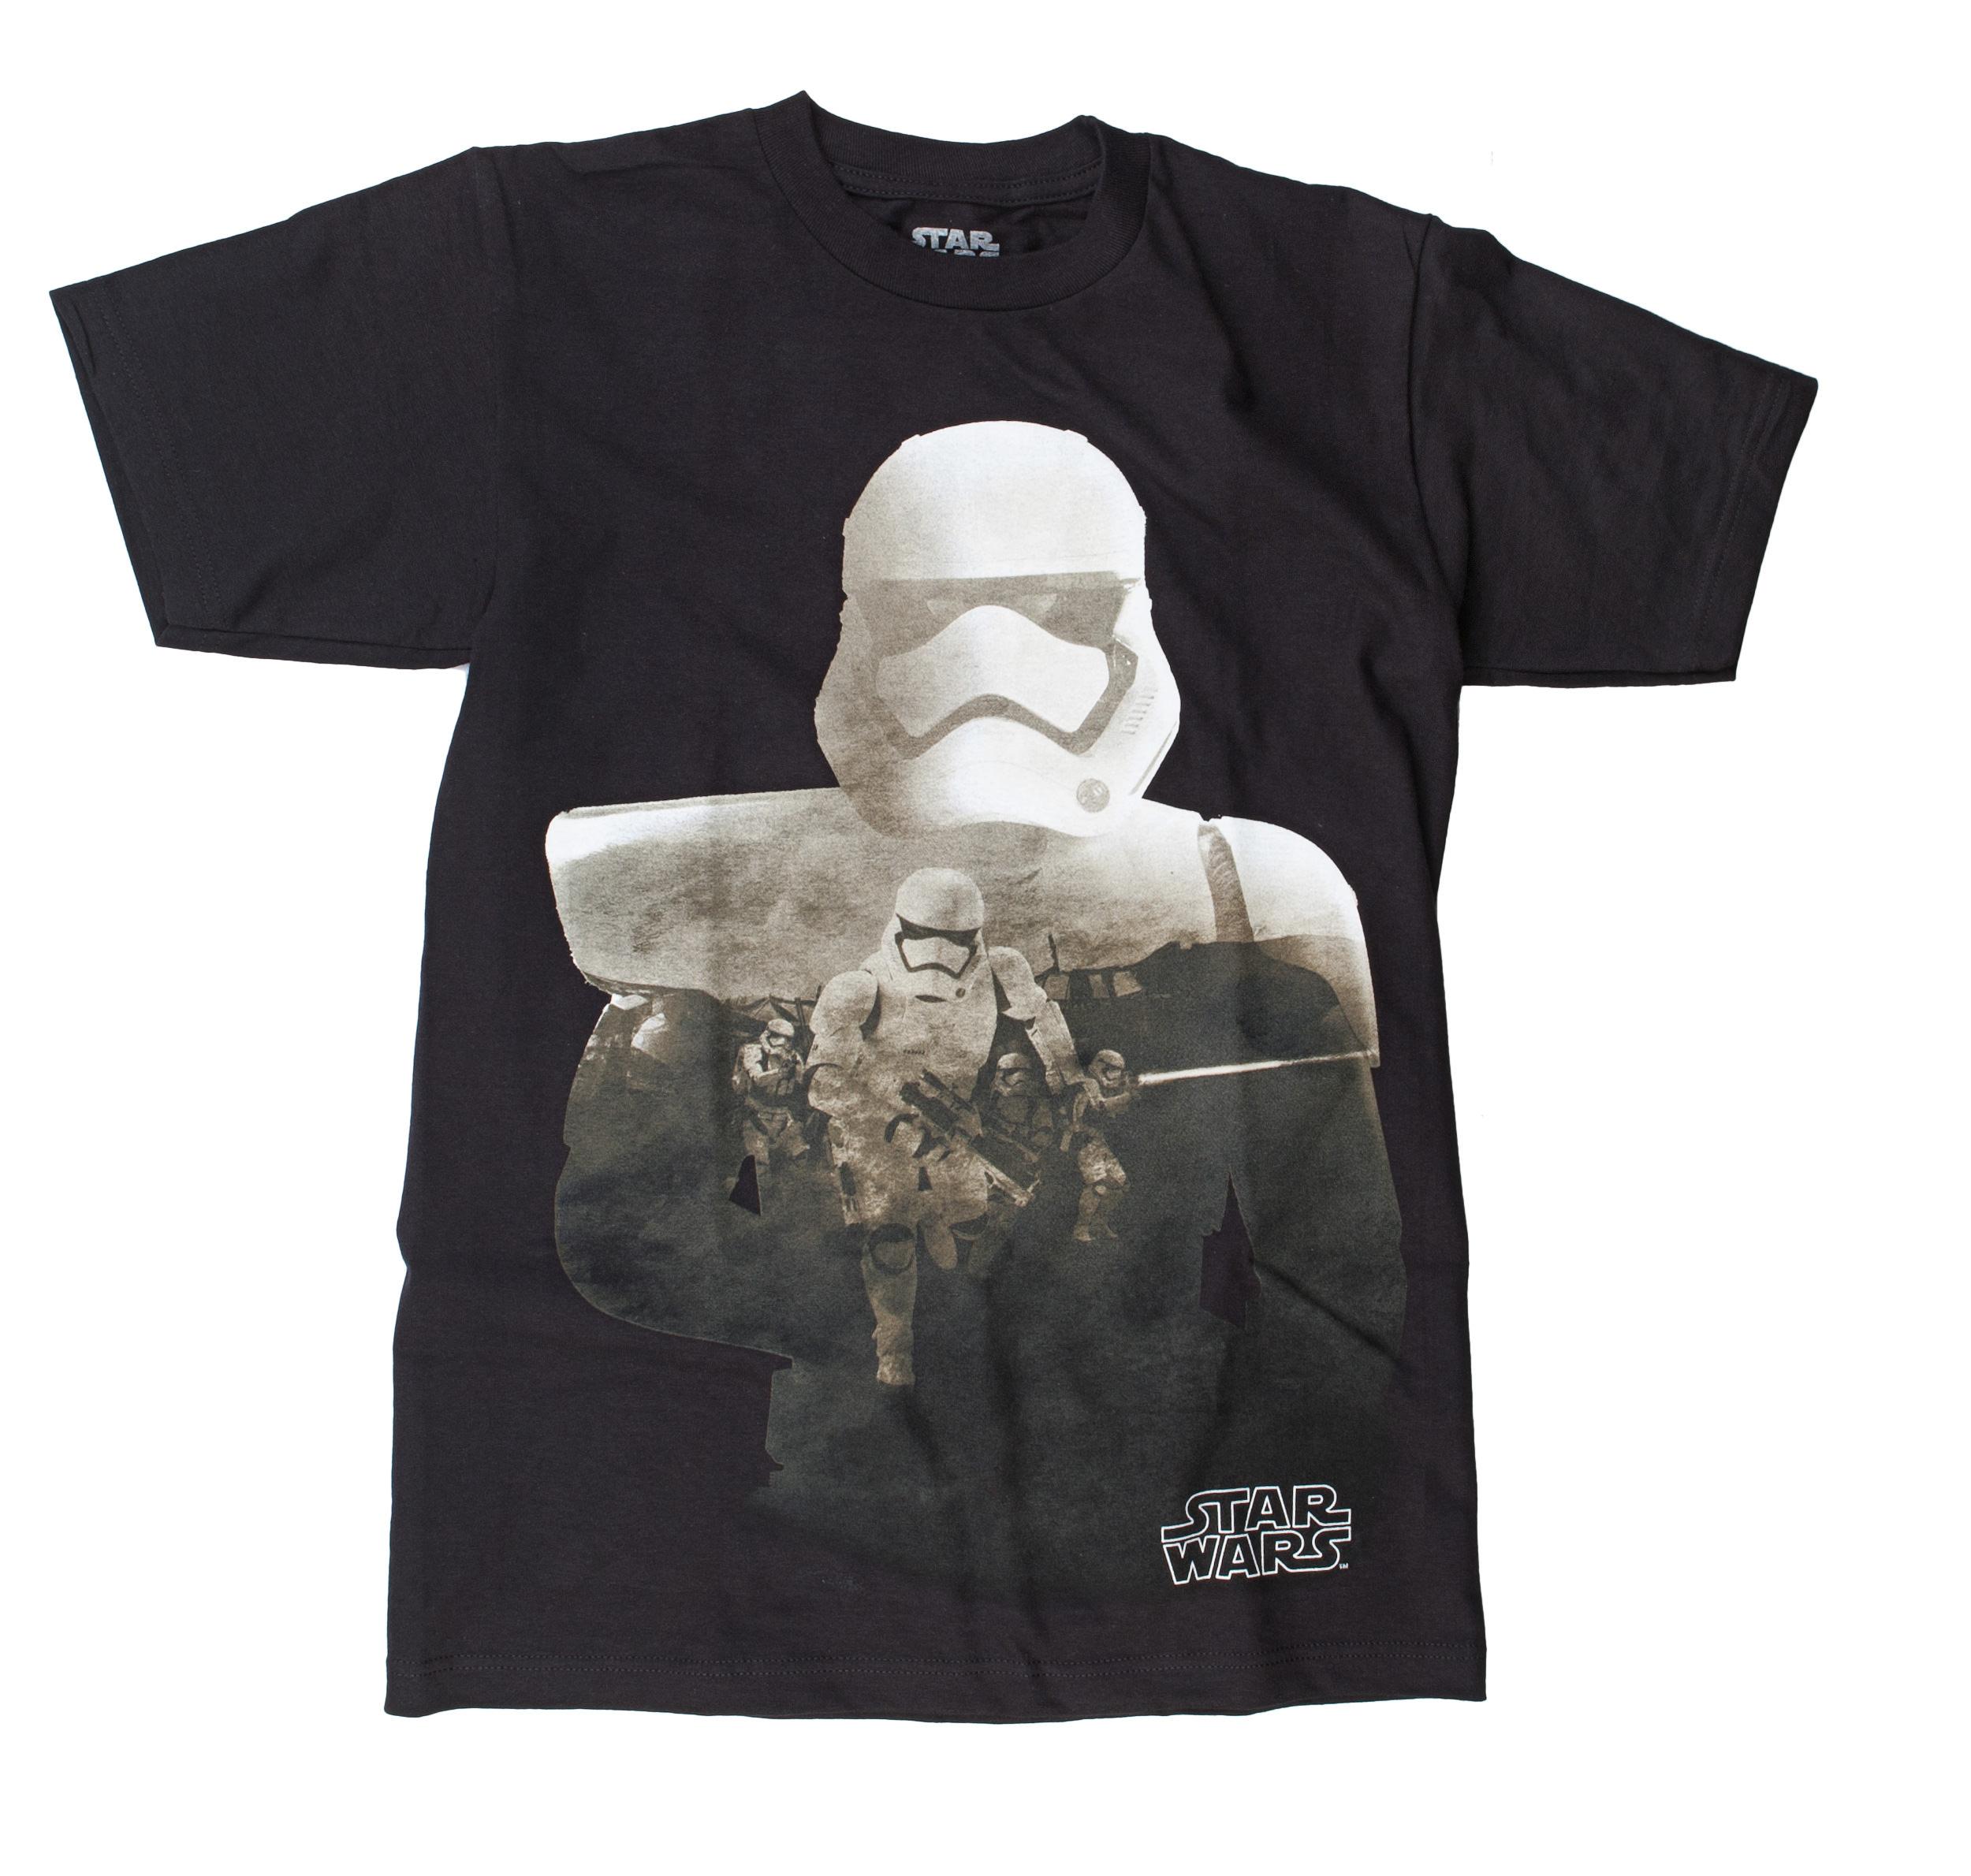 Star Wars VII: The Force Awakens Stormtrooper Filled Silo T-Shirt   2XL